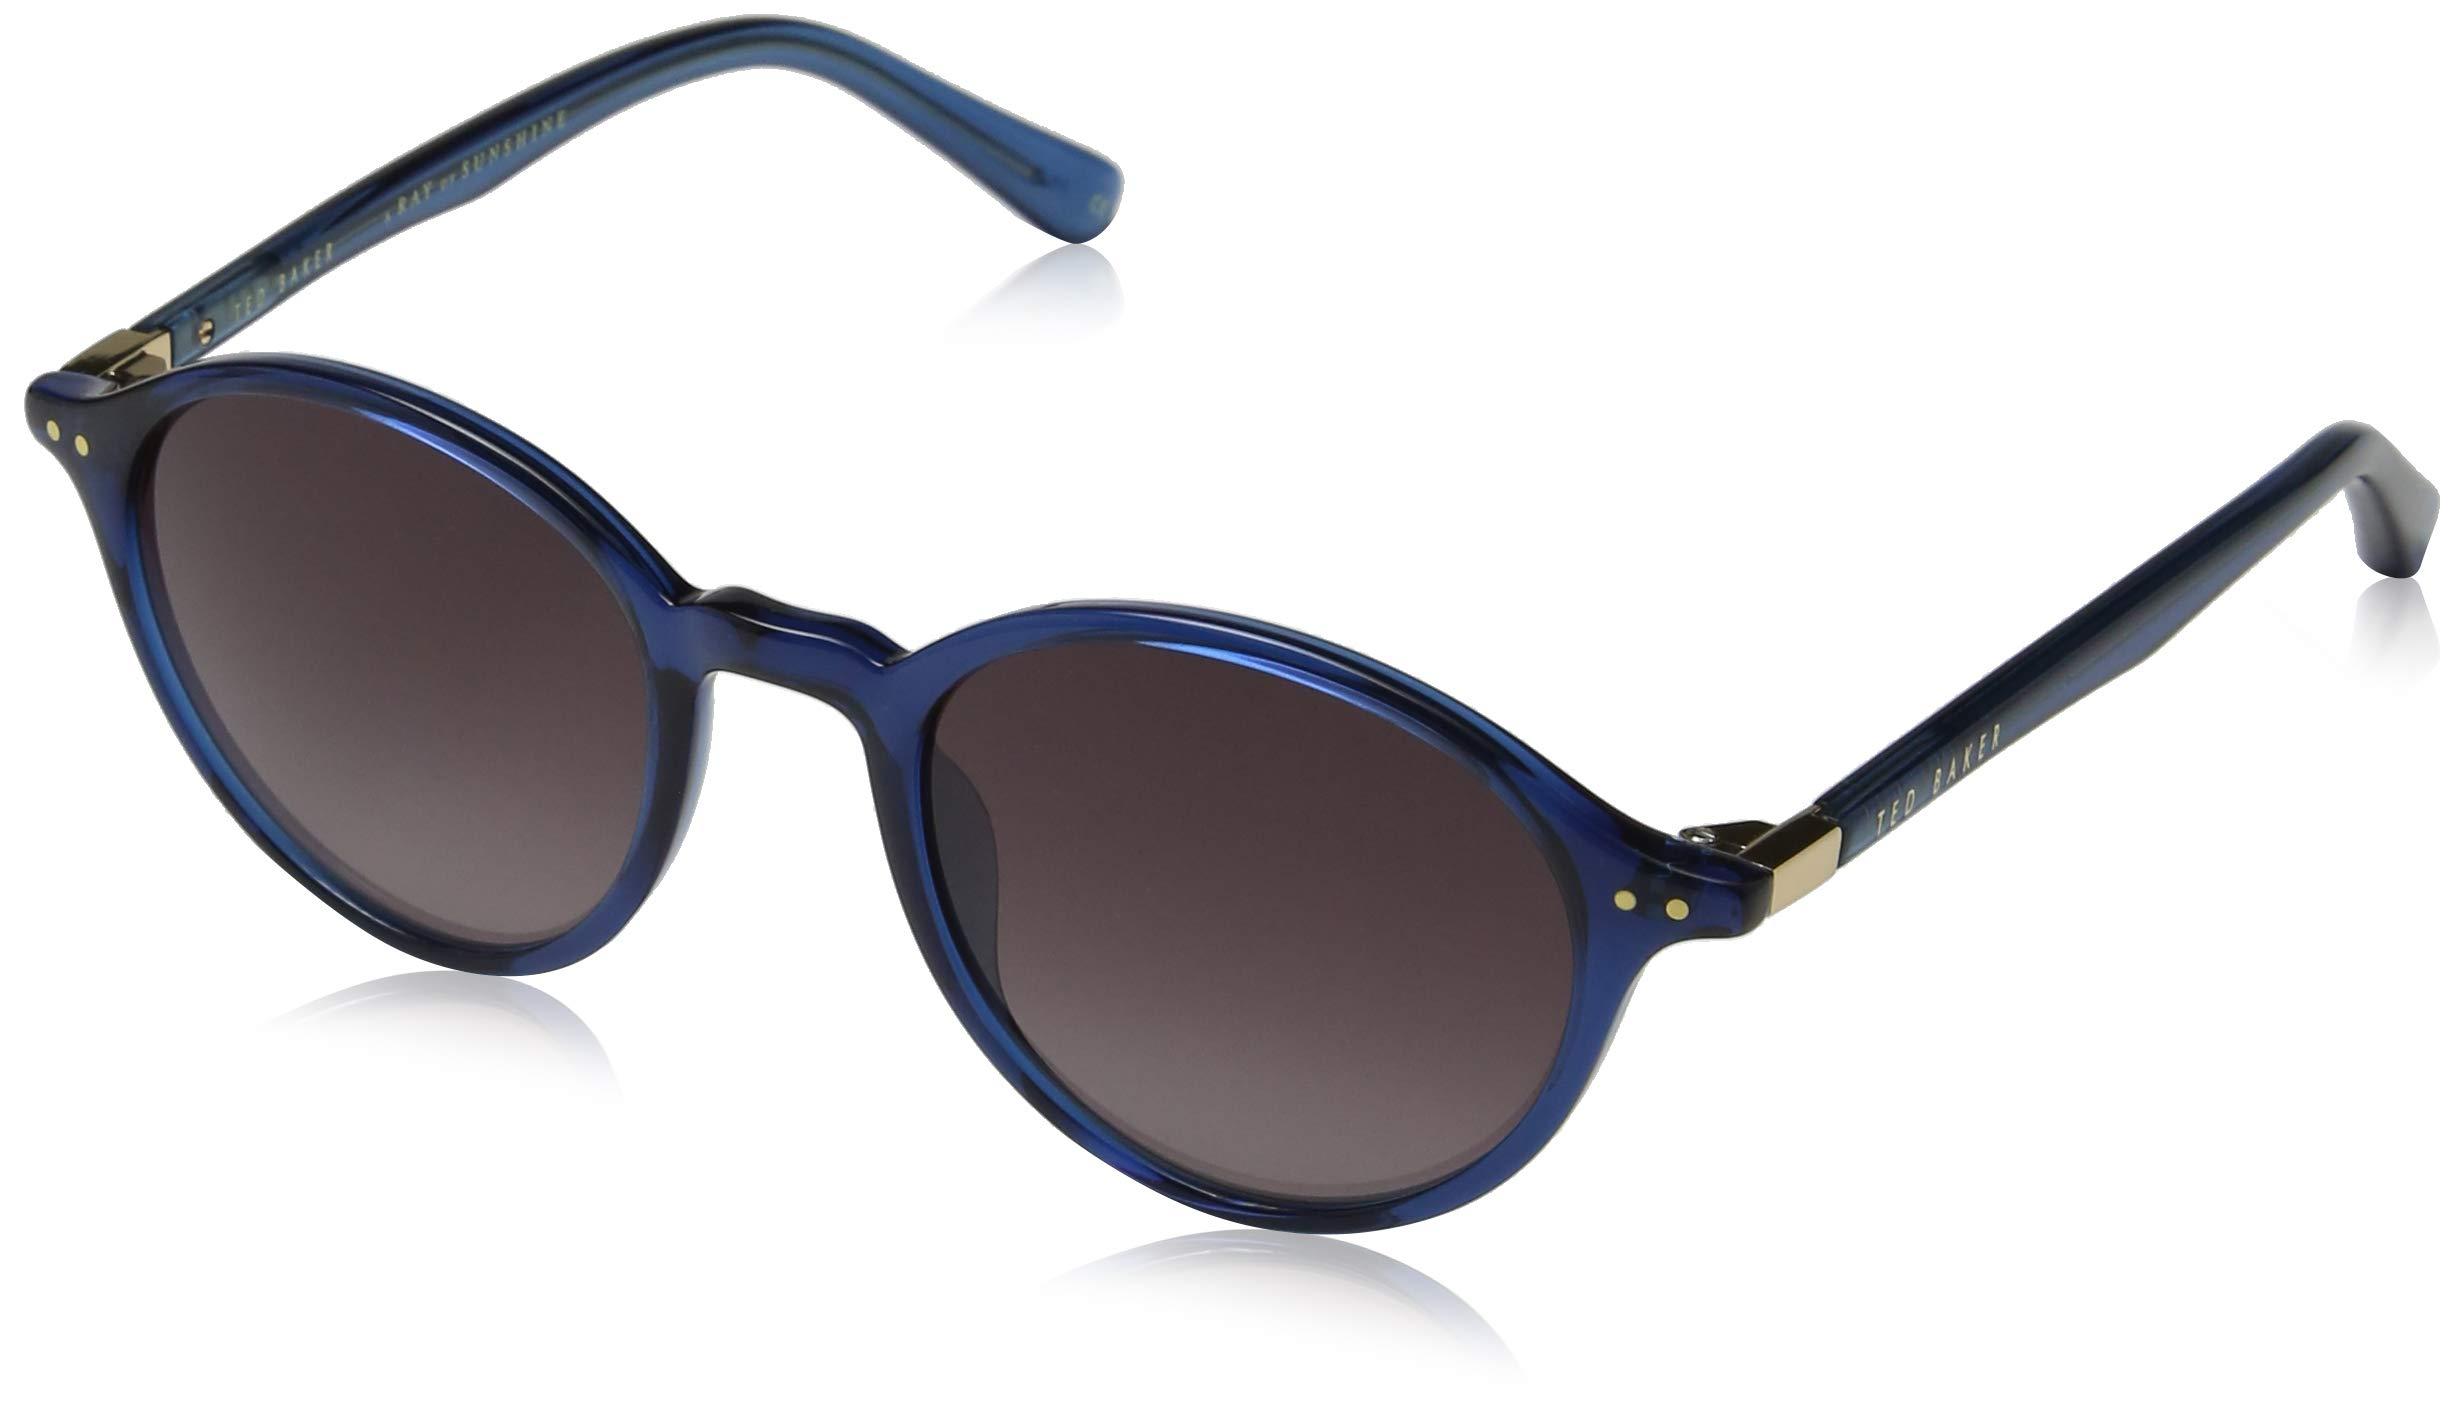 Ted Sunglasses grey50 Lenore De Montures Baker Femme LunettesBleuteal 0 6YvI7gbfy